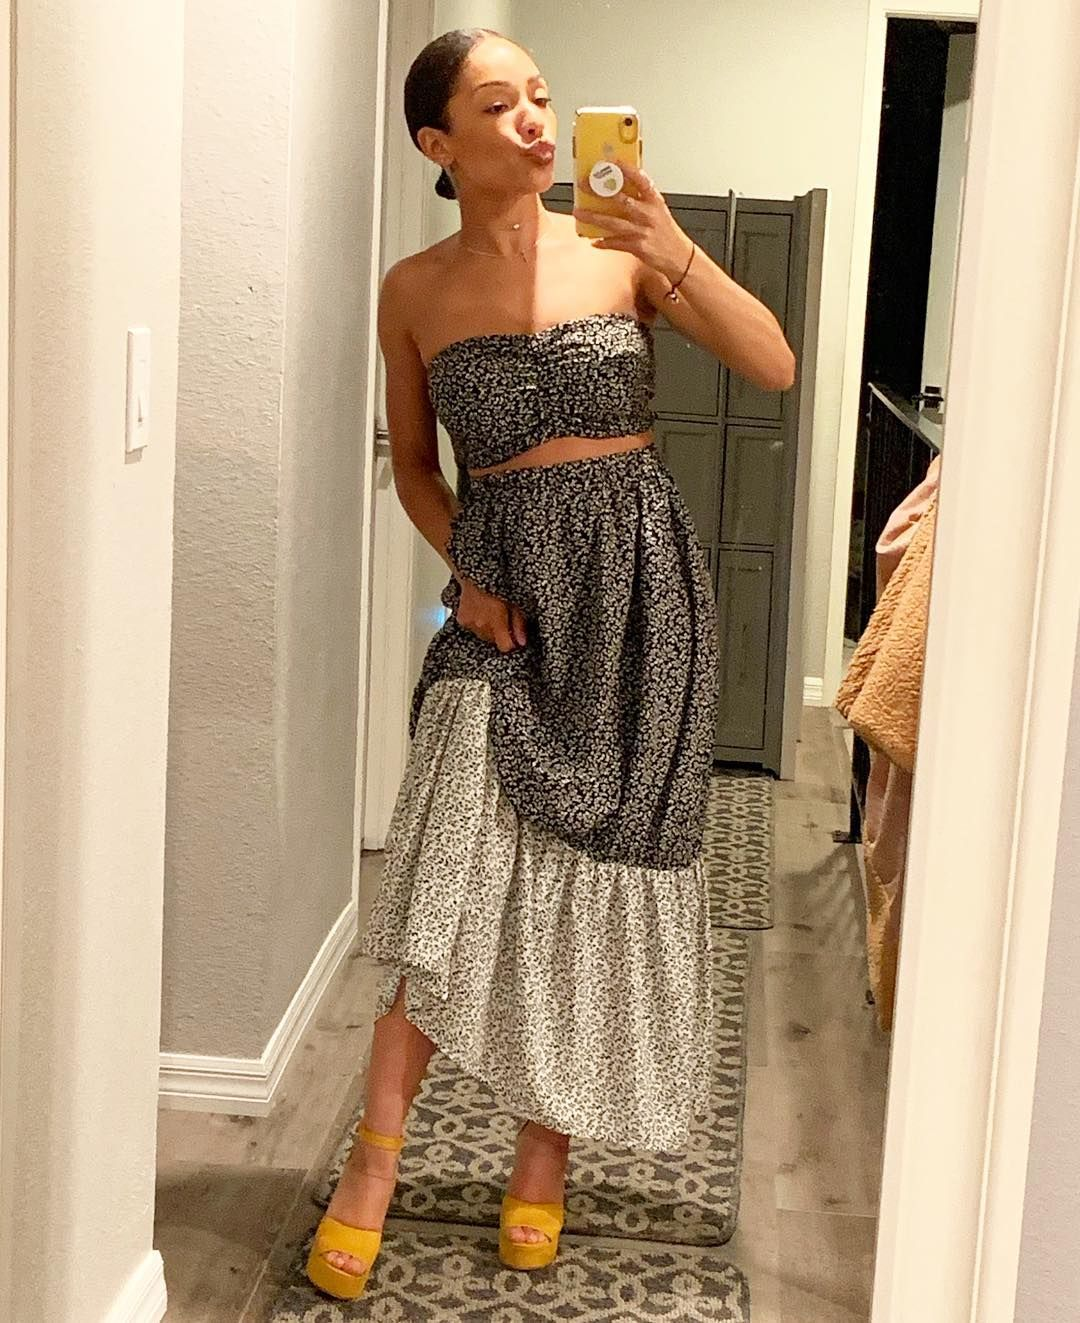 Chrystina Sayers Instagram